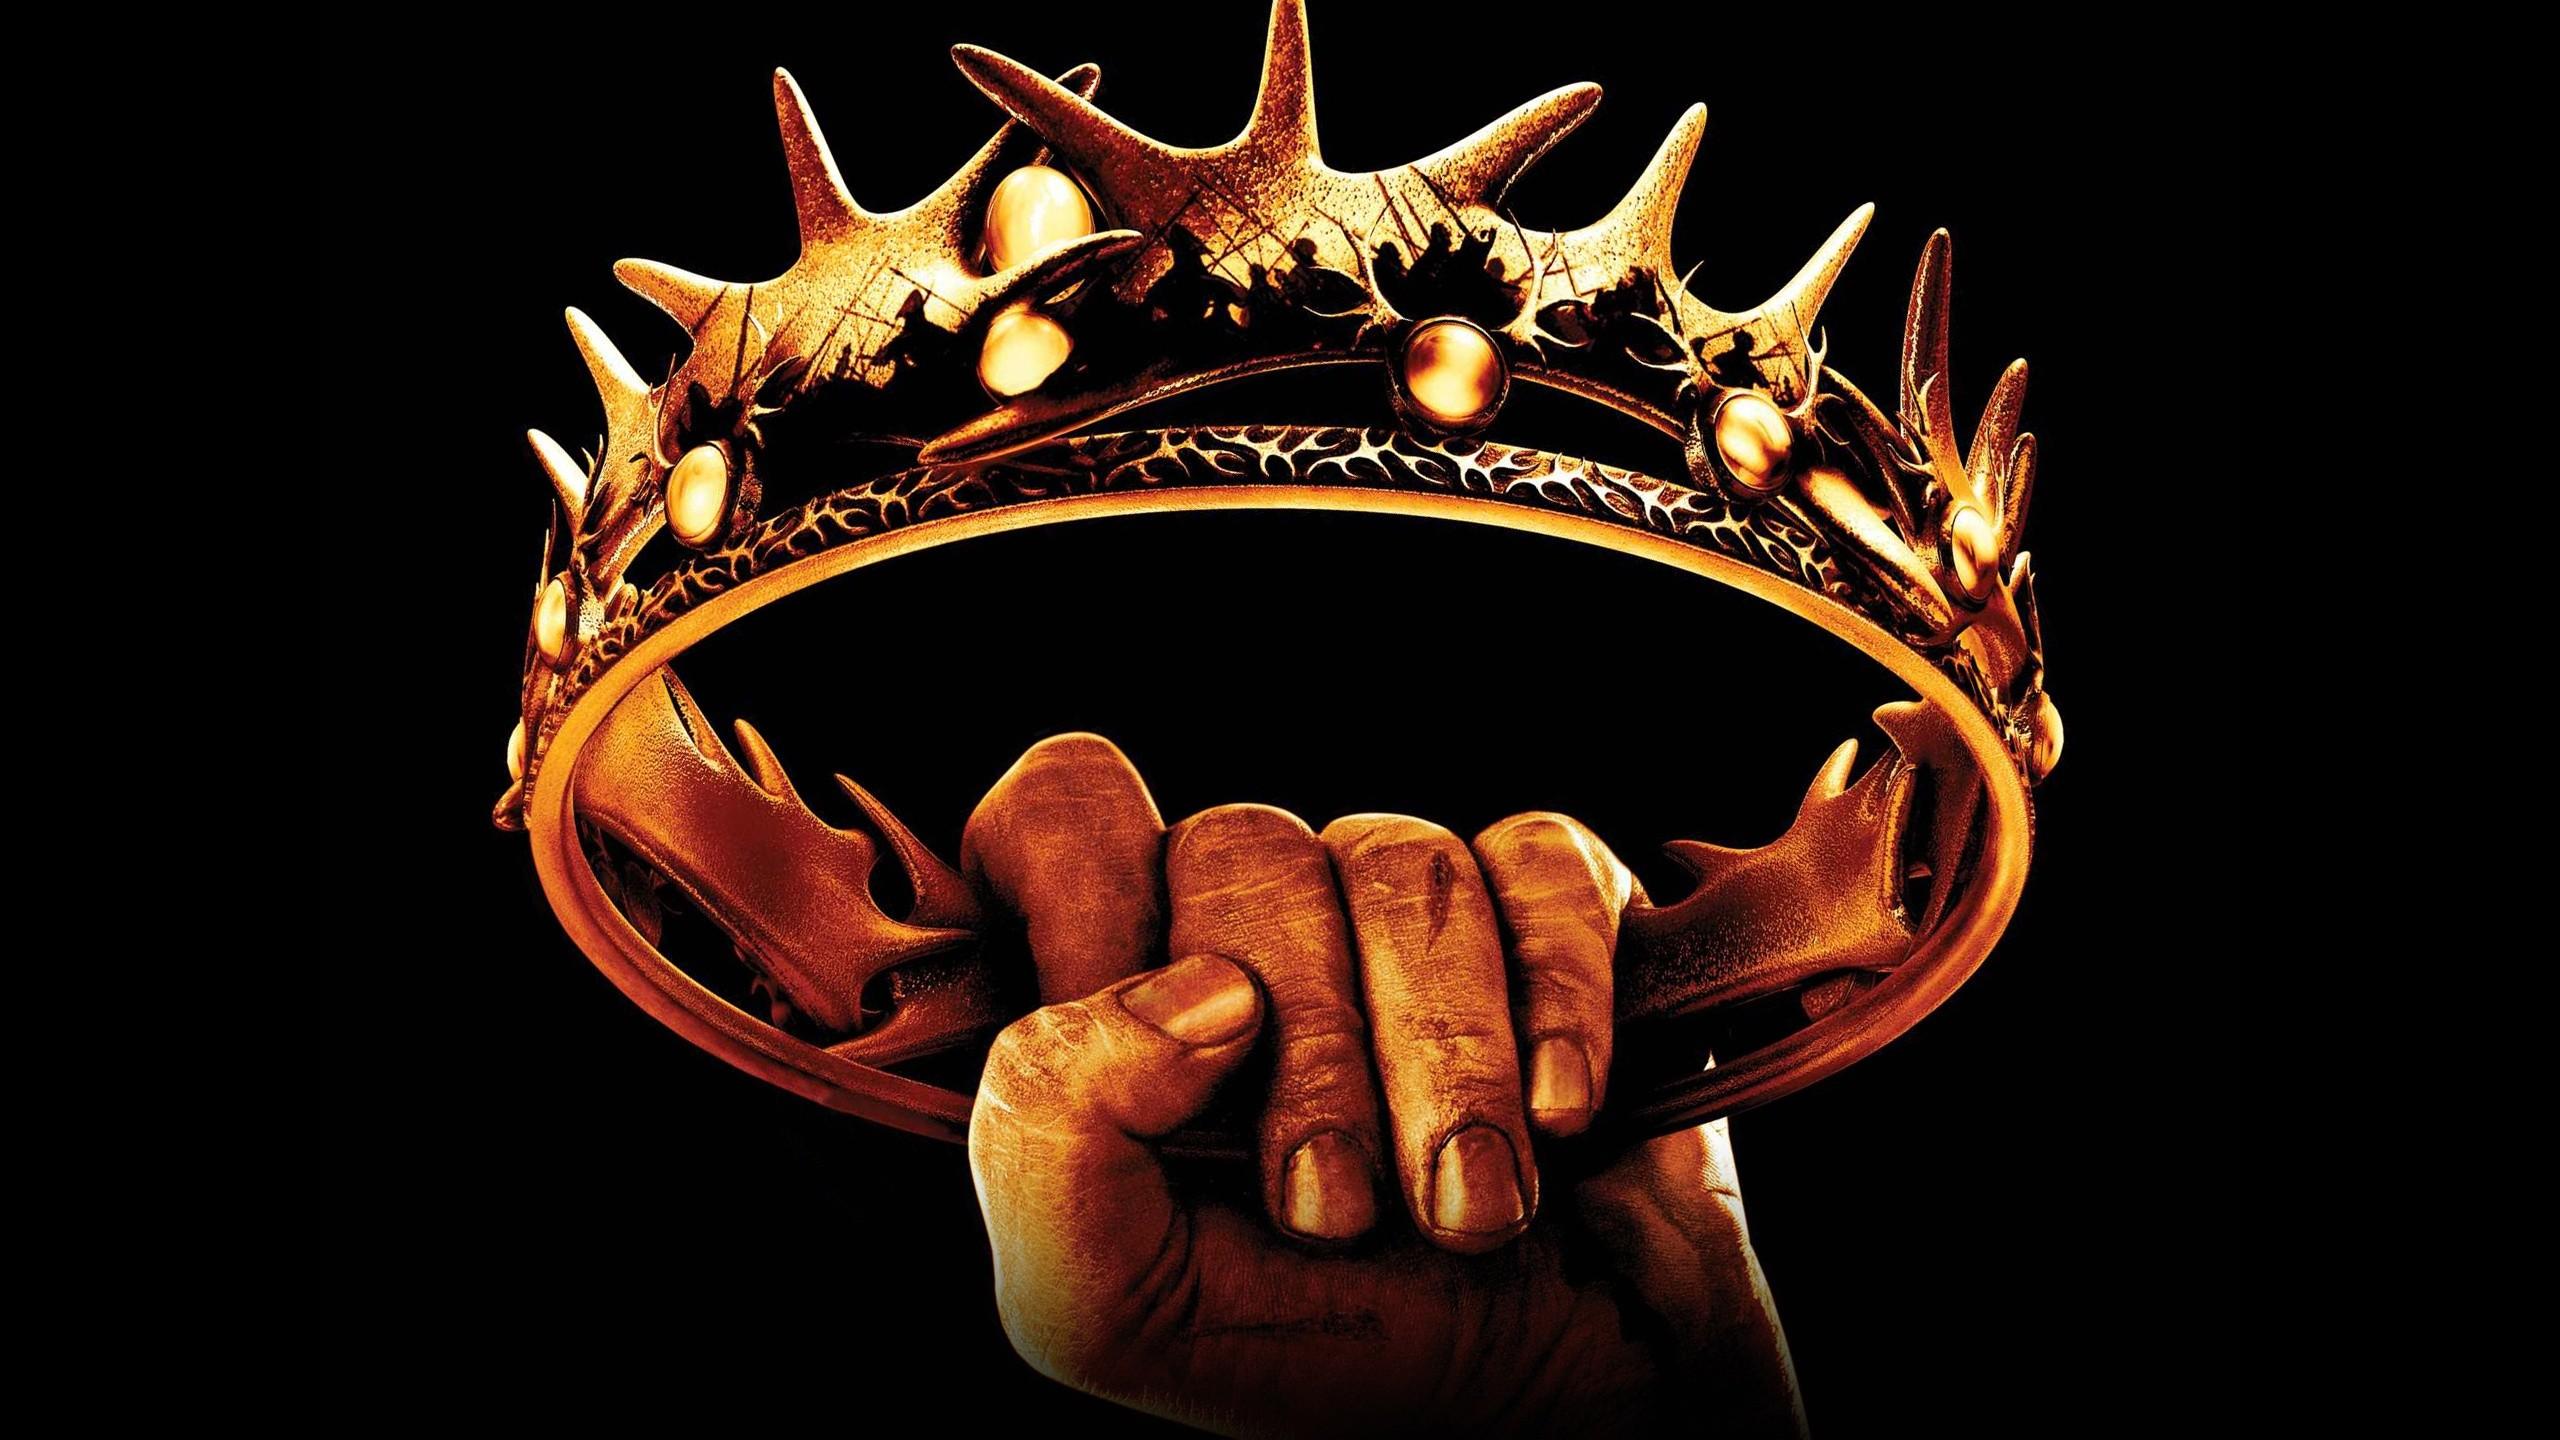 Games of Thrones Season 2